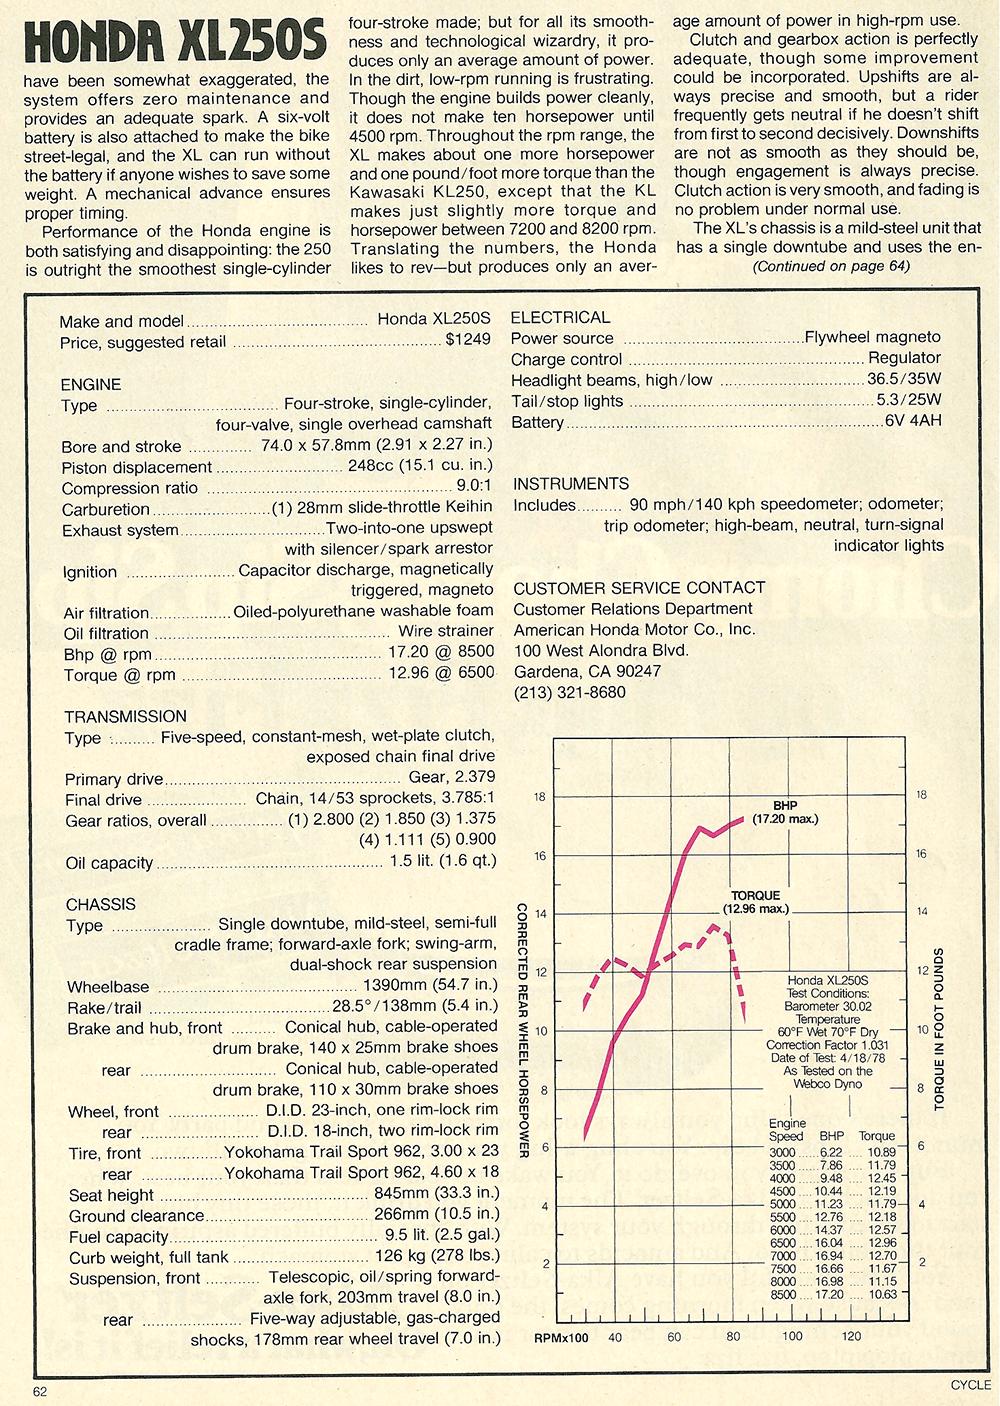 1978 Honda XL250S road test 07.jpg